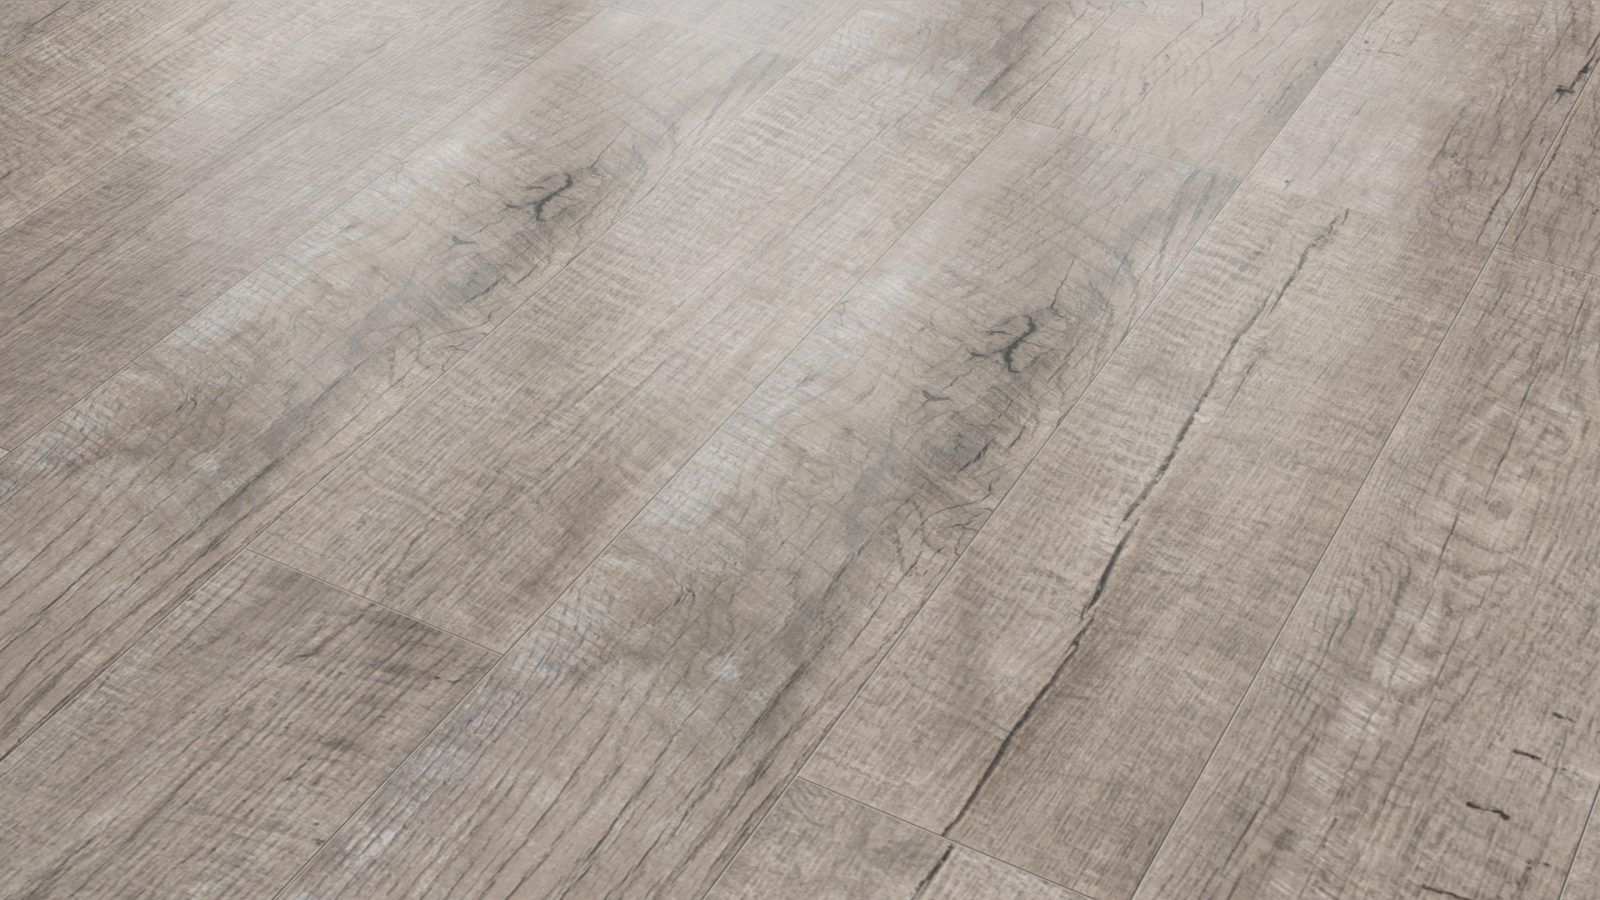 neo 2 0 designboden landhausdiele used barrelwood pvc frei 4 5 mm fu boden boden und skandinavien. Black Bedroom Furniture Sets. Home Design Ideas